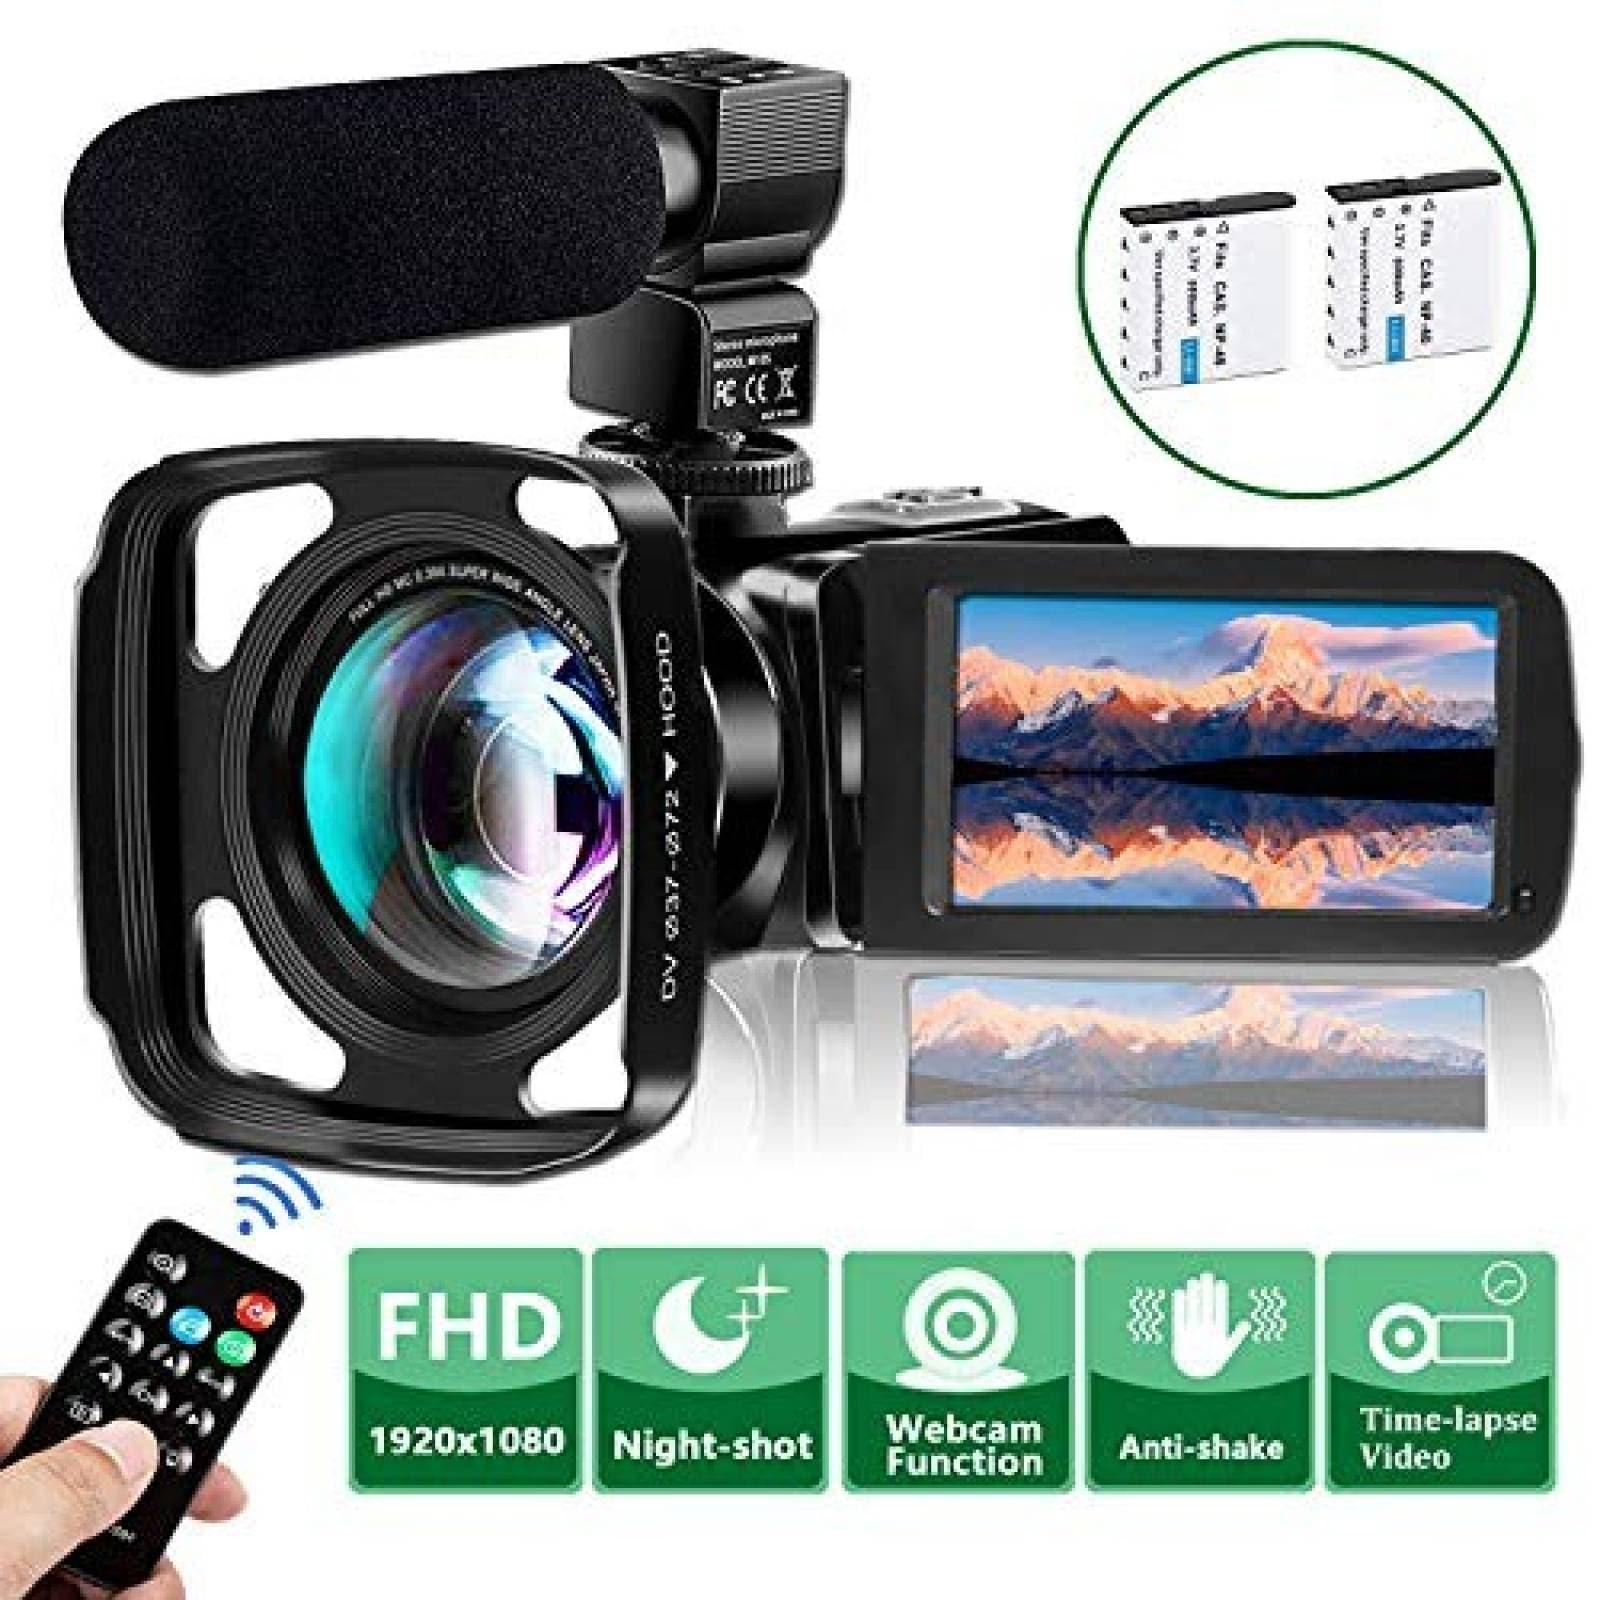 Kit cámara de video VideoSky gran angular 2 baterías -Negro